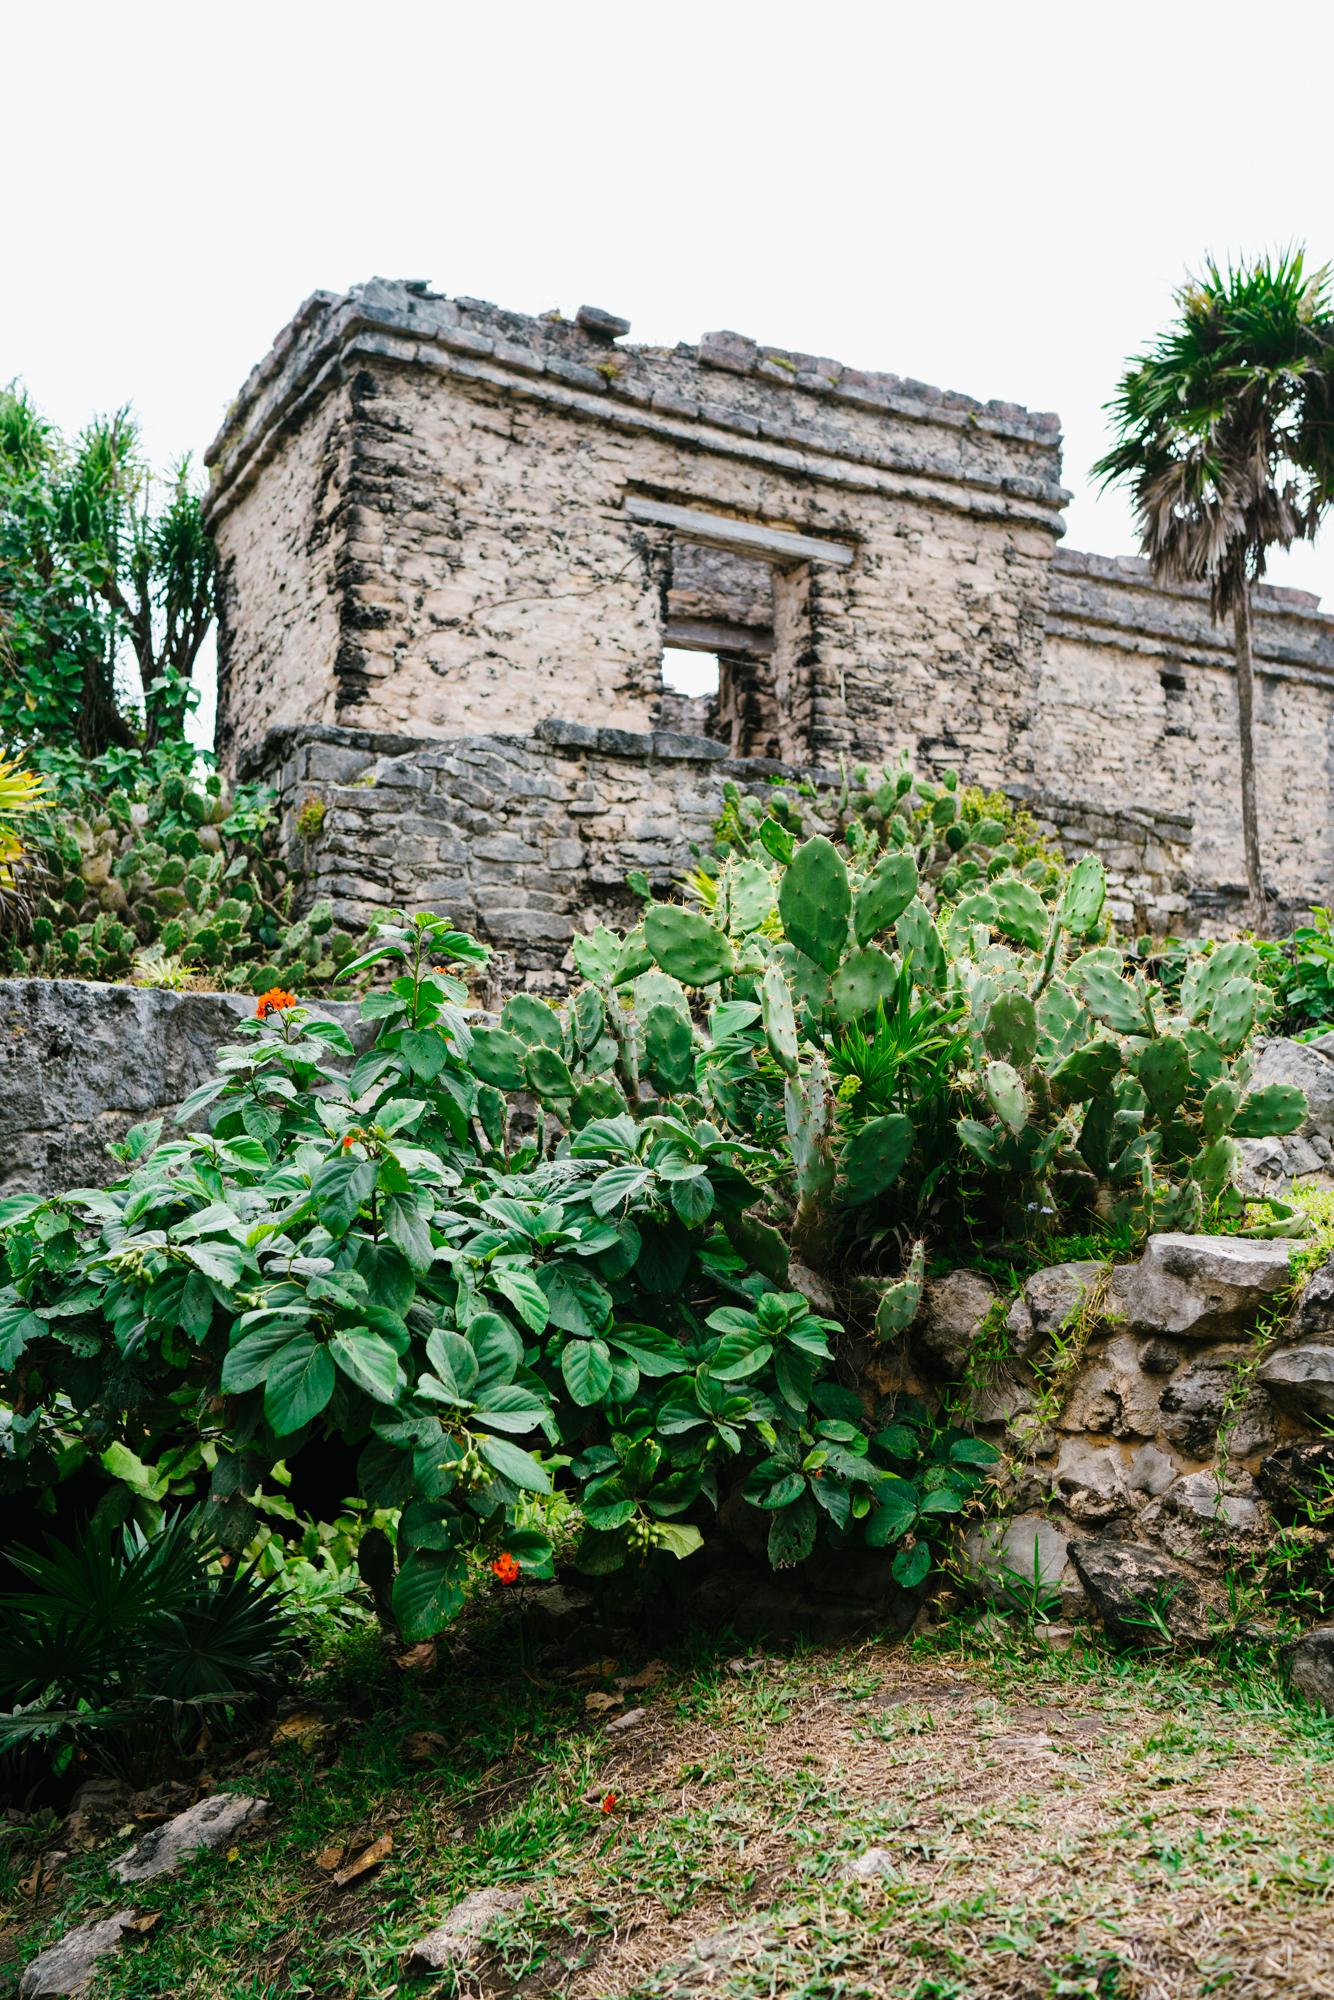 One of the three main ruins in Tulum